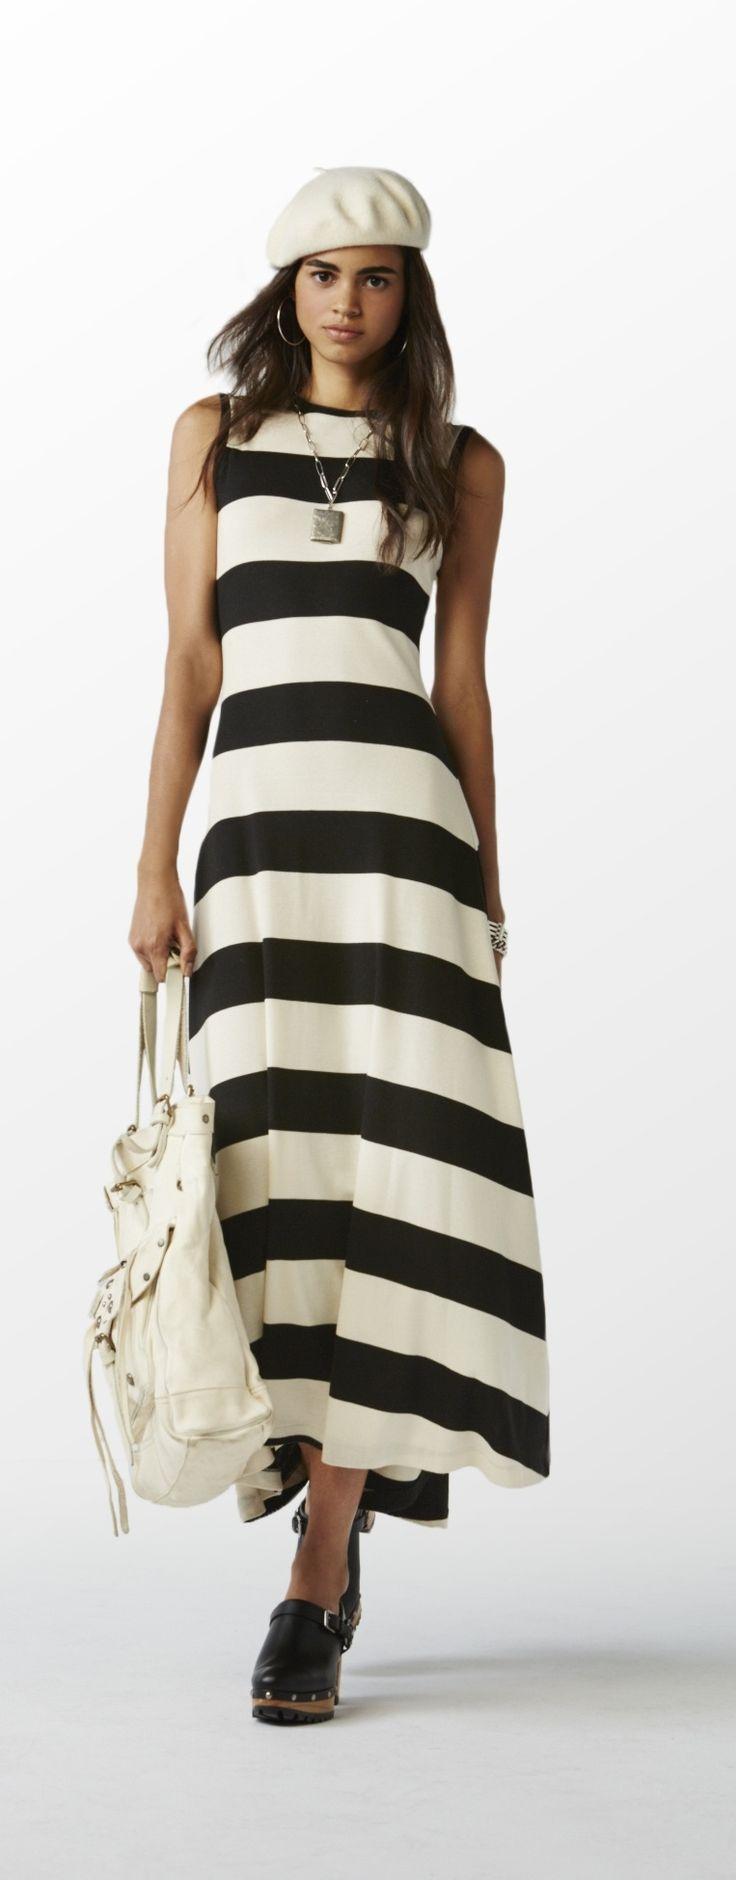 The Polo Ralph Lauren Maxi Dress: This season\u0026#39;s essential transition piece